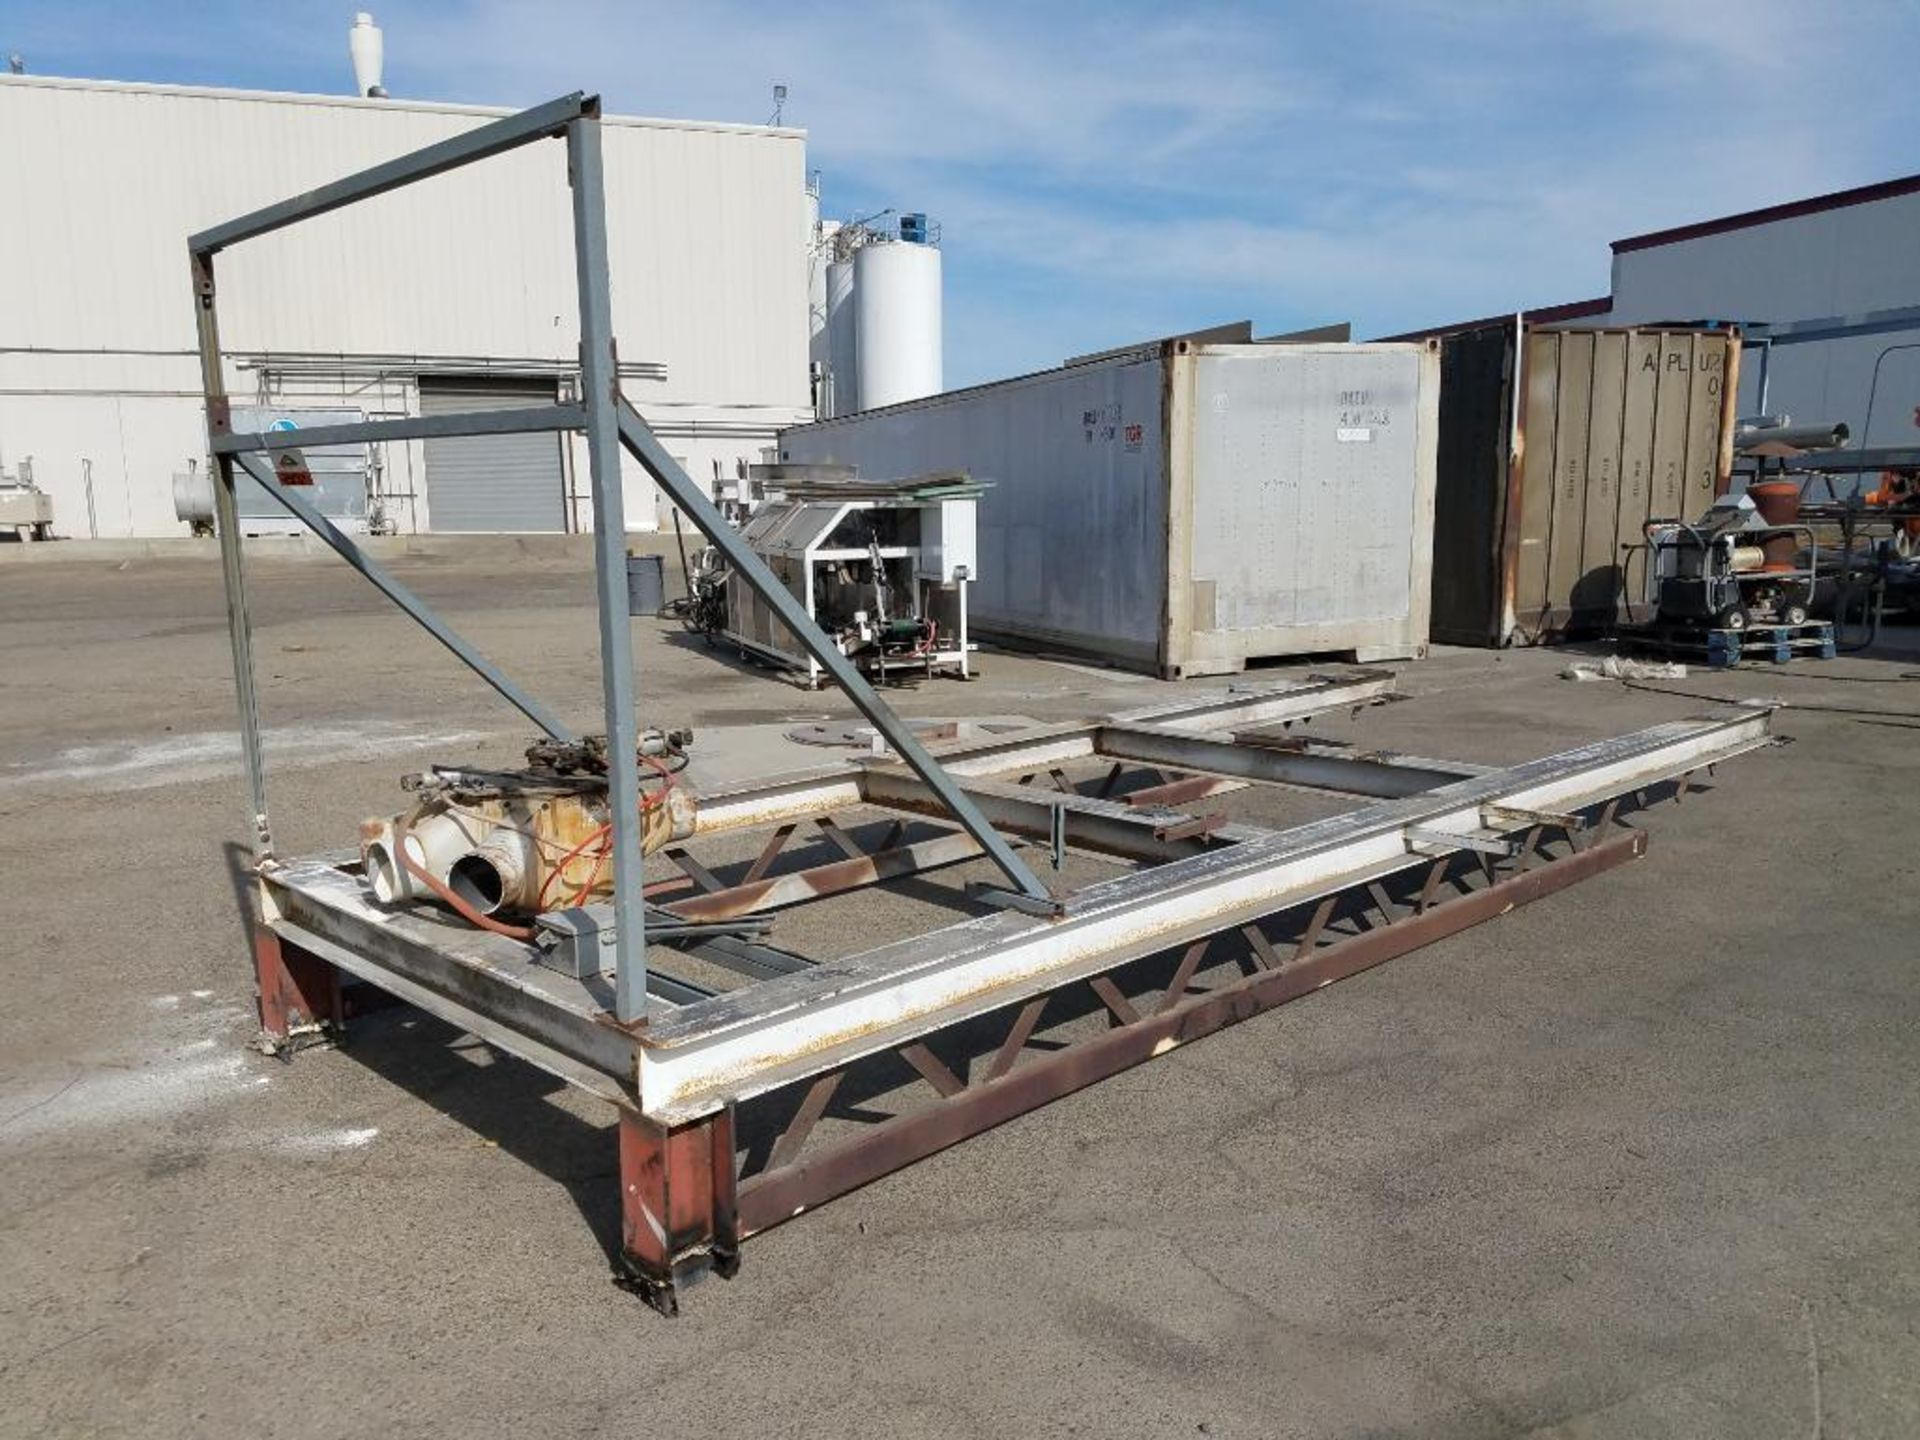 blower diverter with frame, aluminum mezzanine, steam washer, and Fallas cartoner